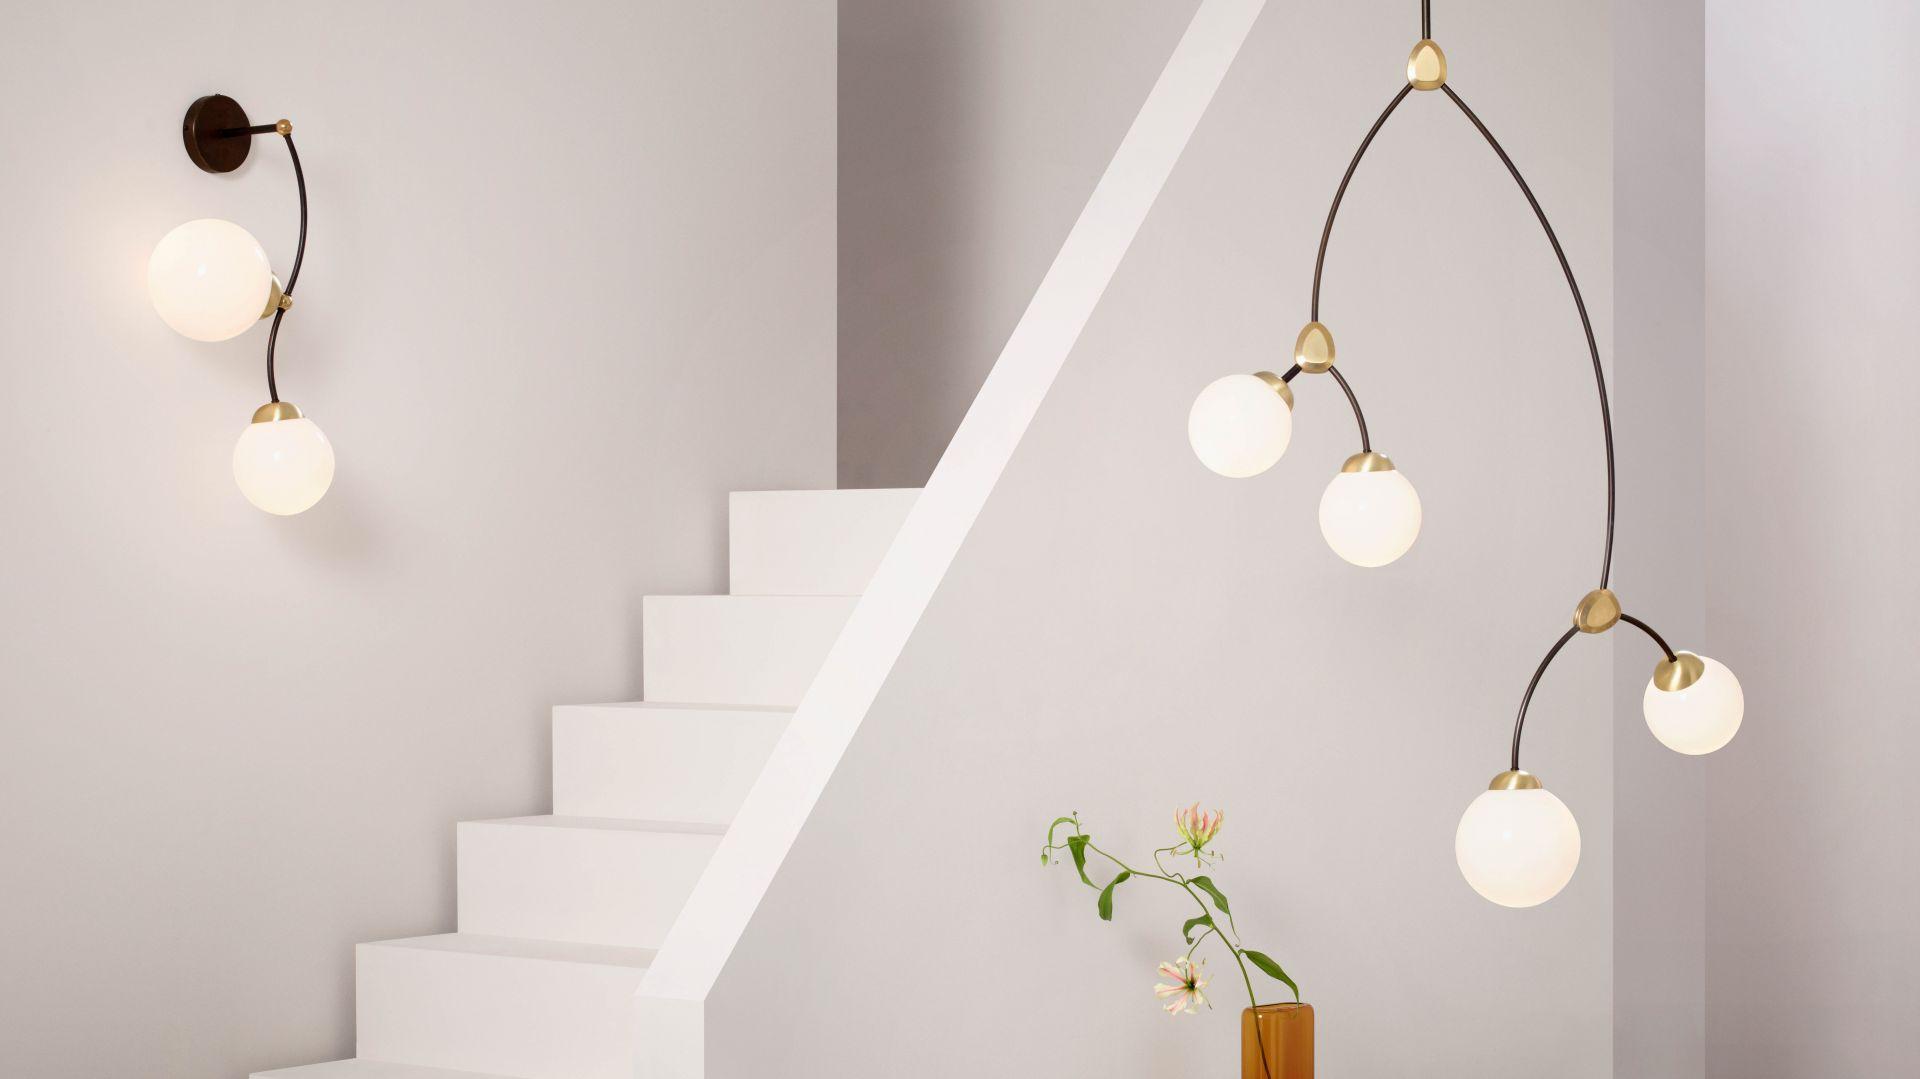 Kolekcja lamp Ivy. Fot. CTO Lighting / Mood-Design